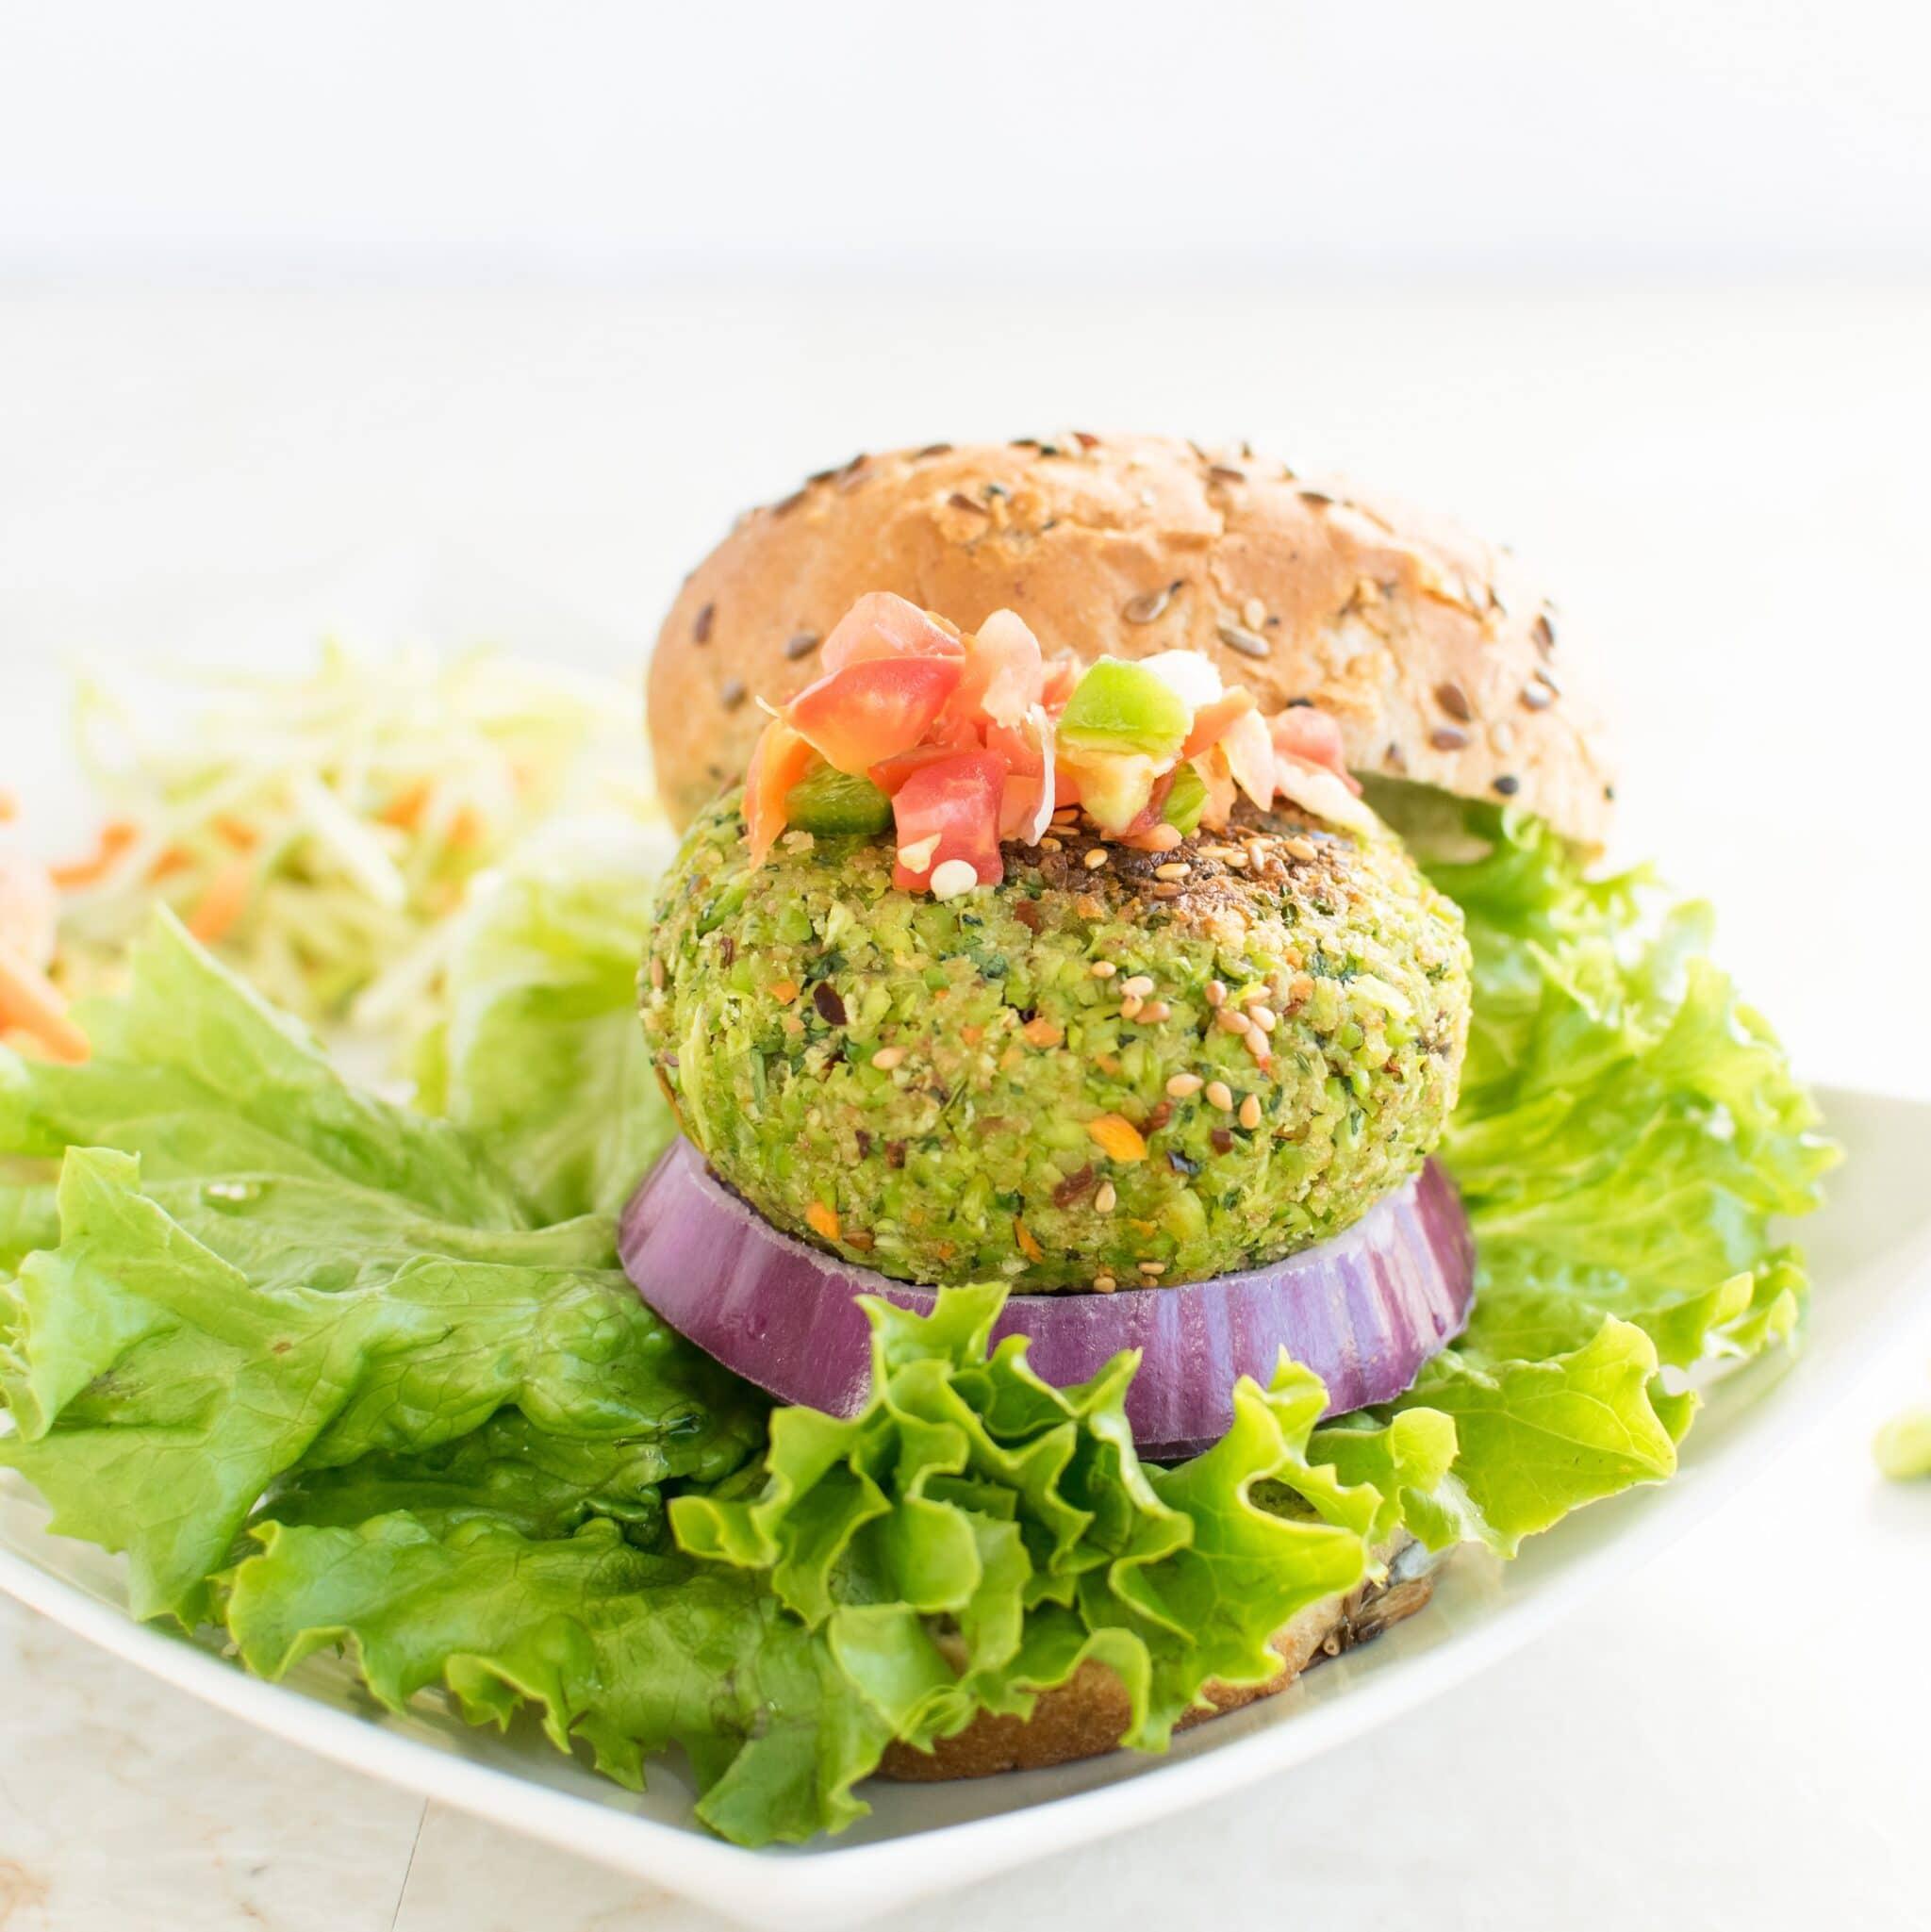 Cilantro Edamame Burger | Protein rich vegan burger to celebarte ...